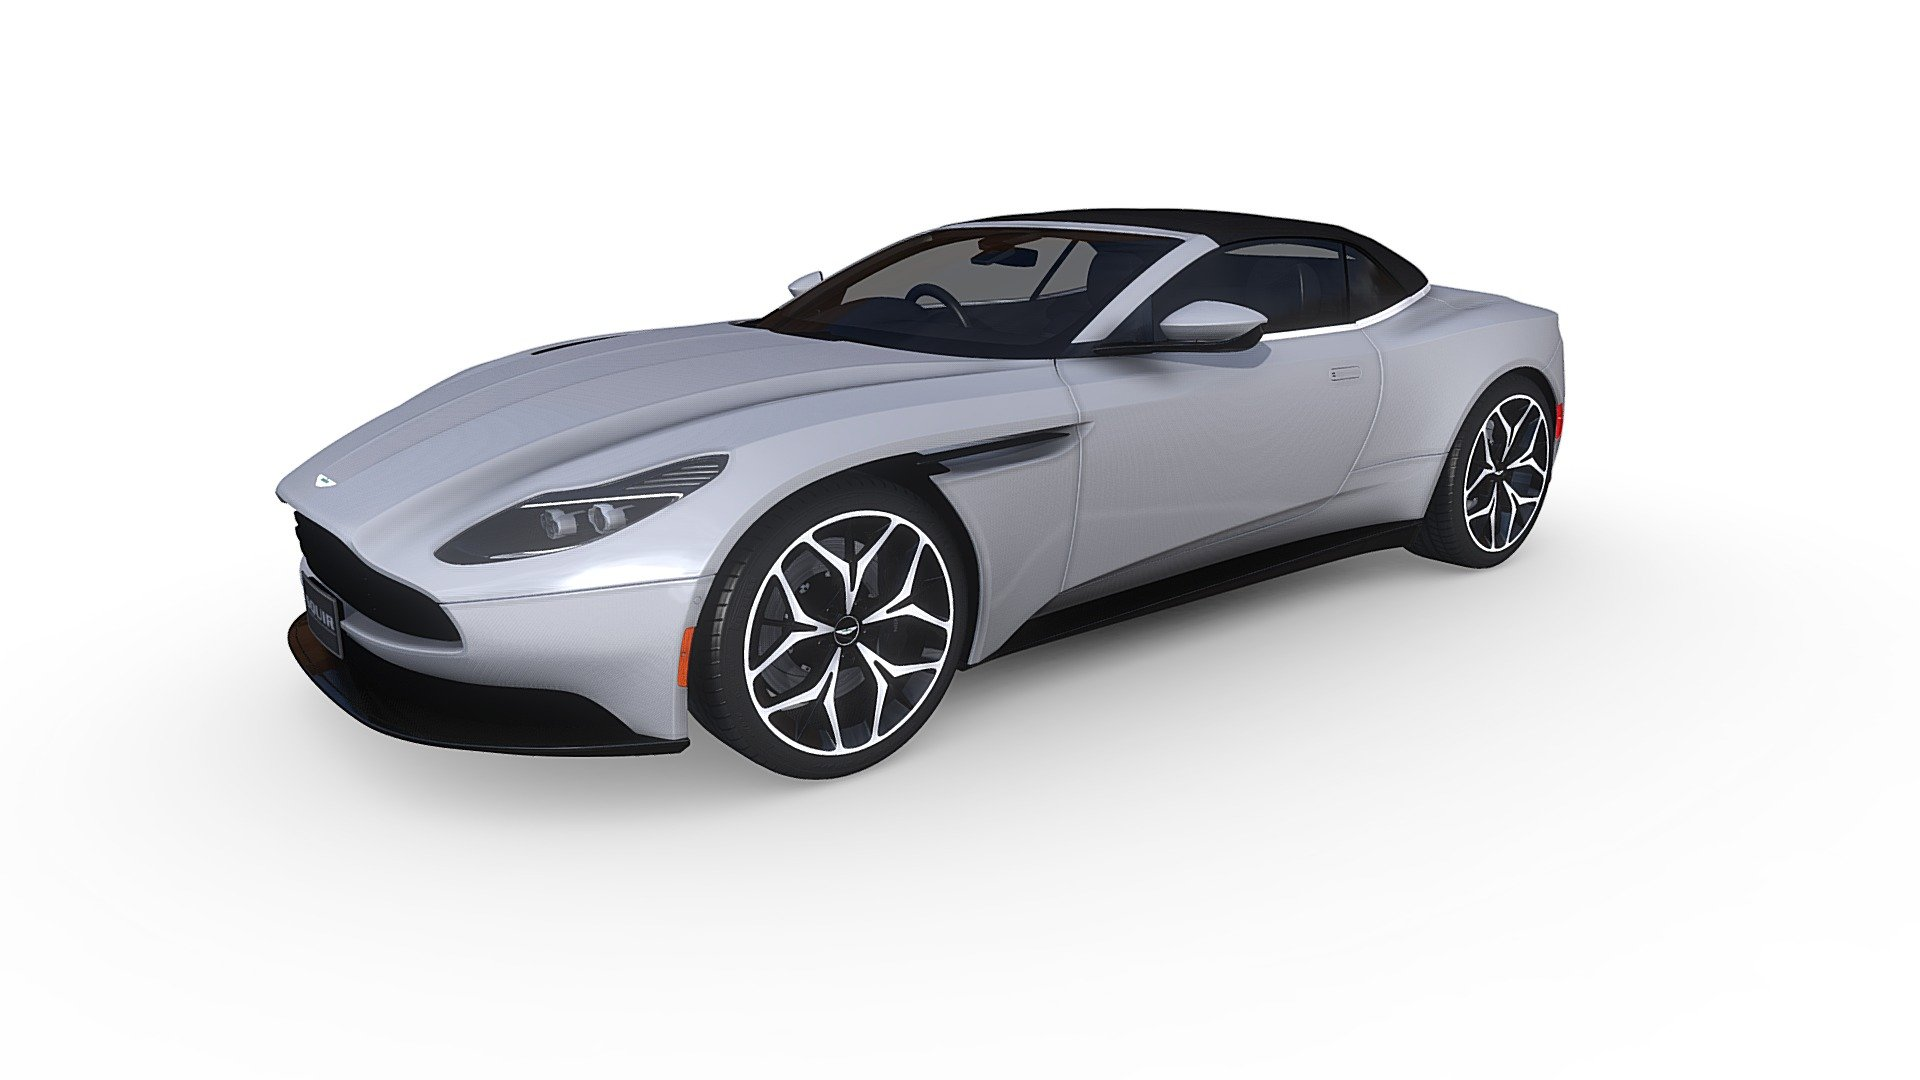 Aston Martin Db11 Volante 2019 Buy Royalty Free 3d Model By Squir3d Squir3d B0e84e2 Sketchfab Store